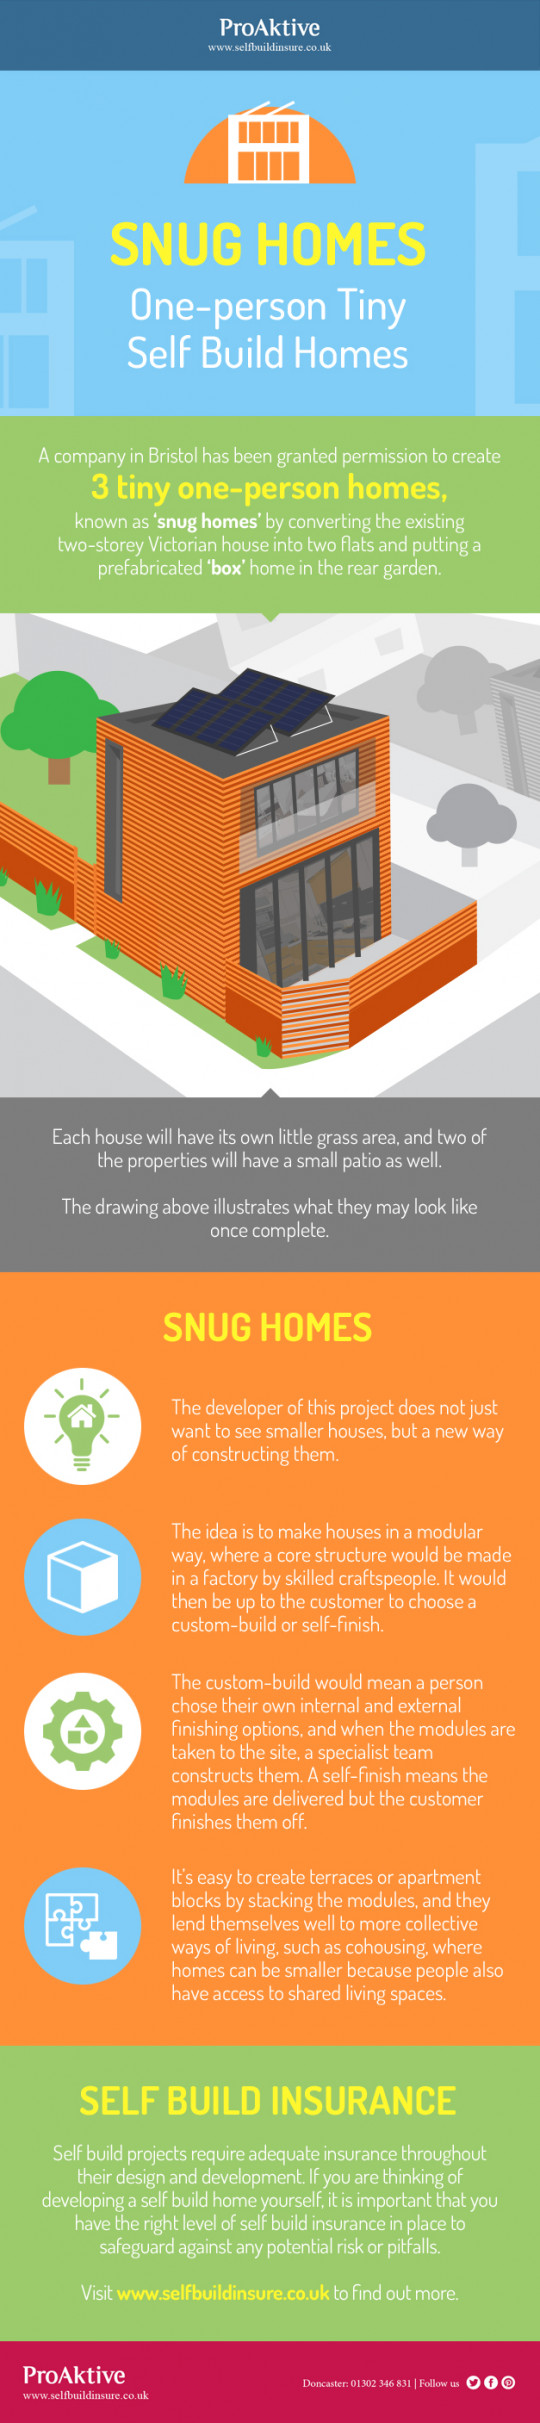 Snug Homes: One-person Tiny Self Build Homes